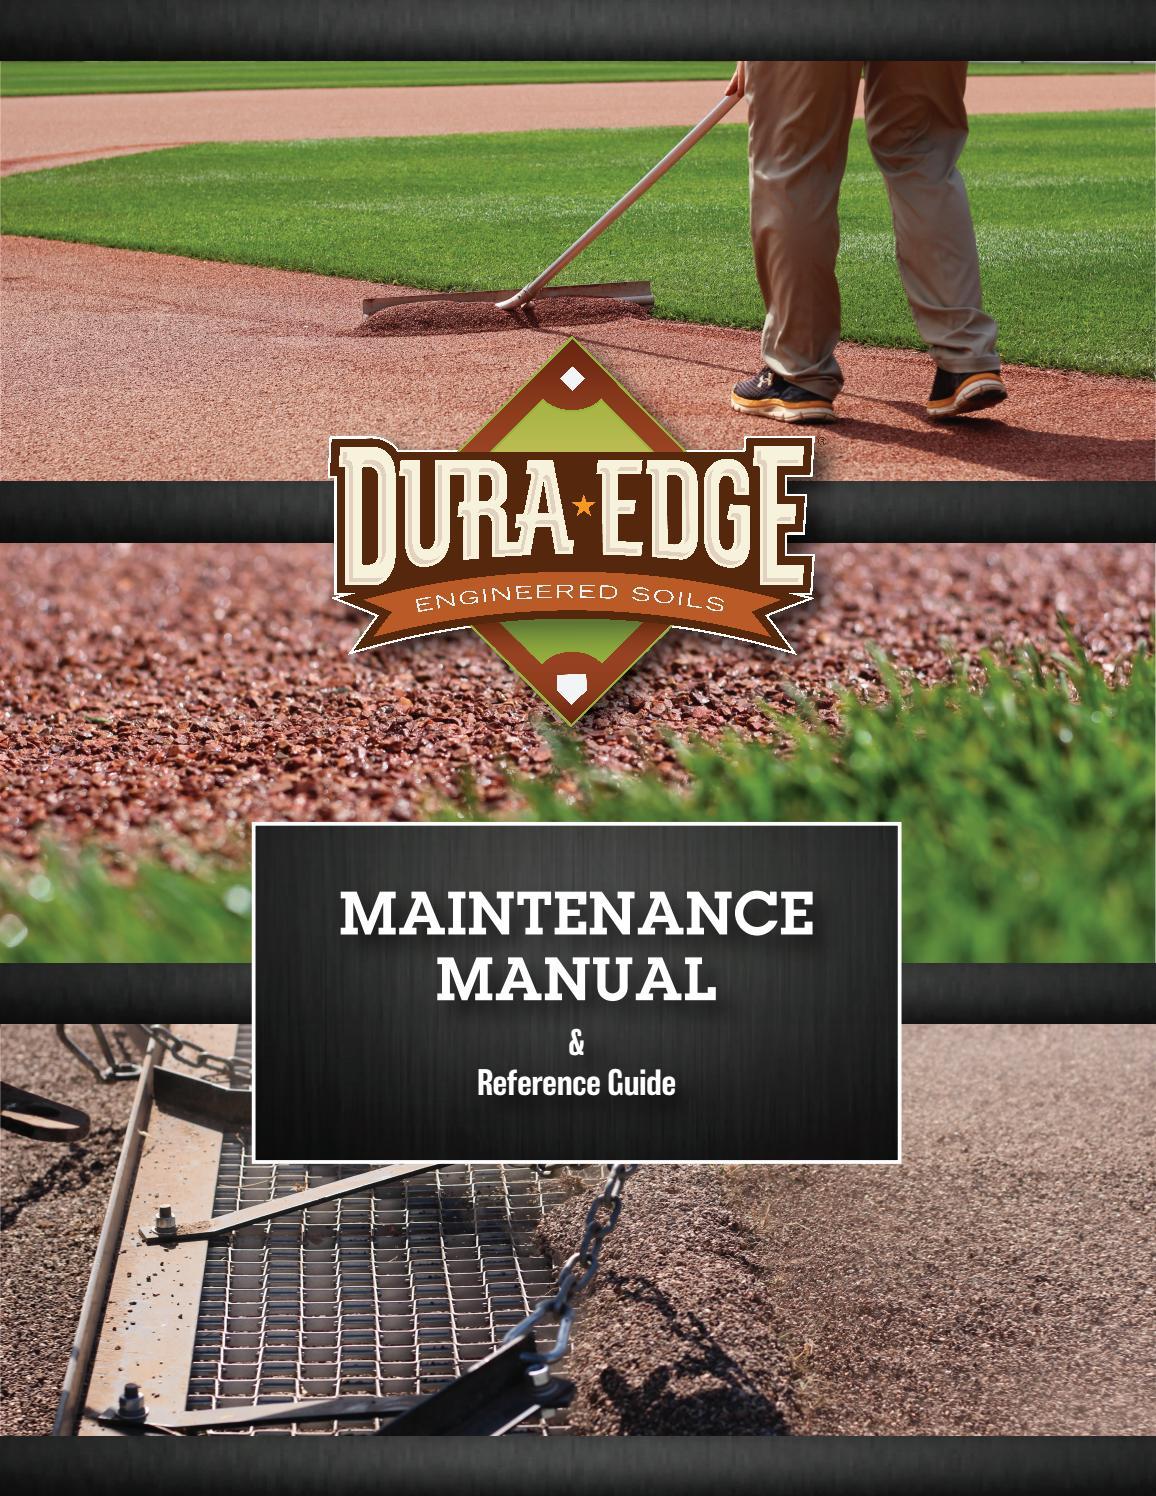 2017-2018 DuraEdge Maintenance Manual by DuraEdge - issuu